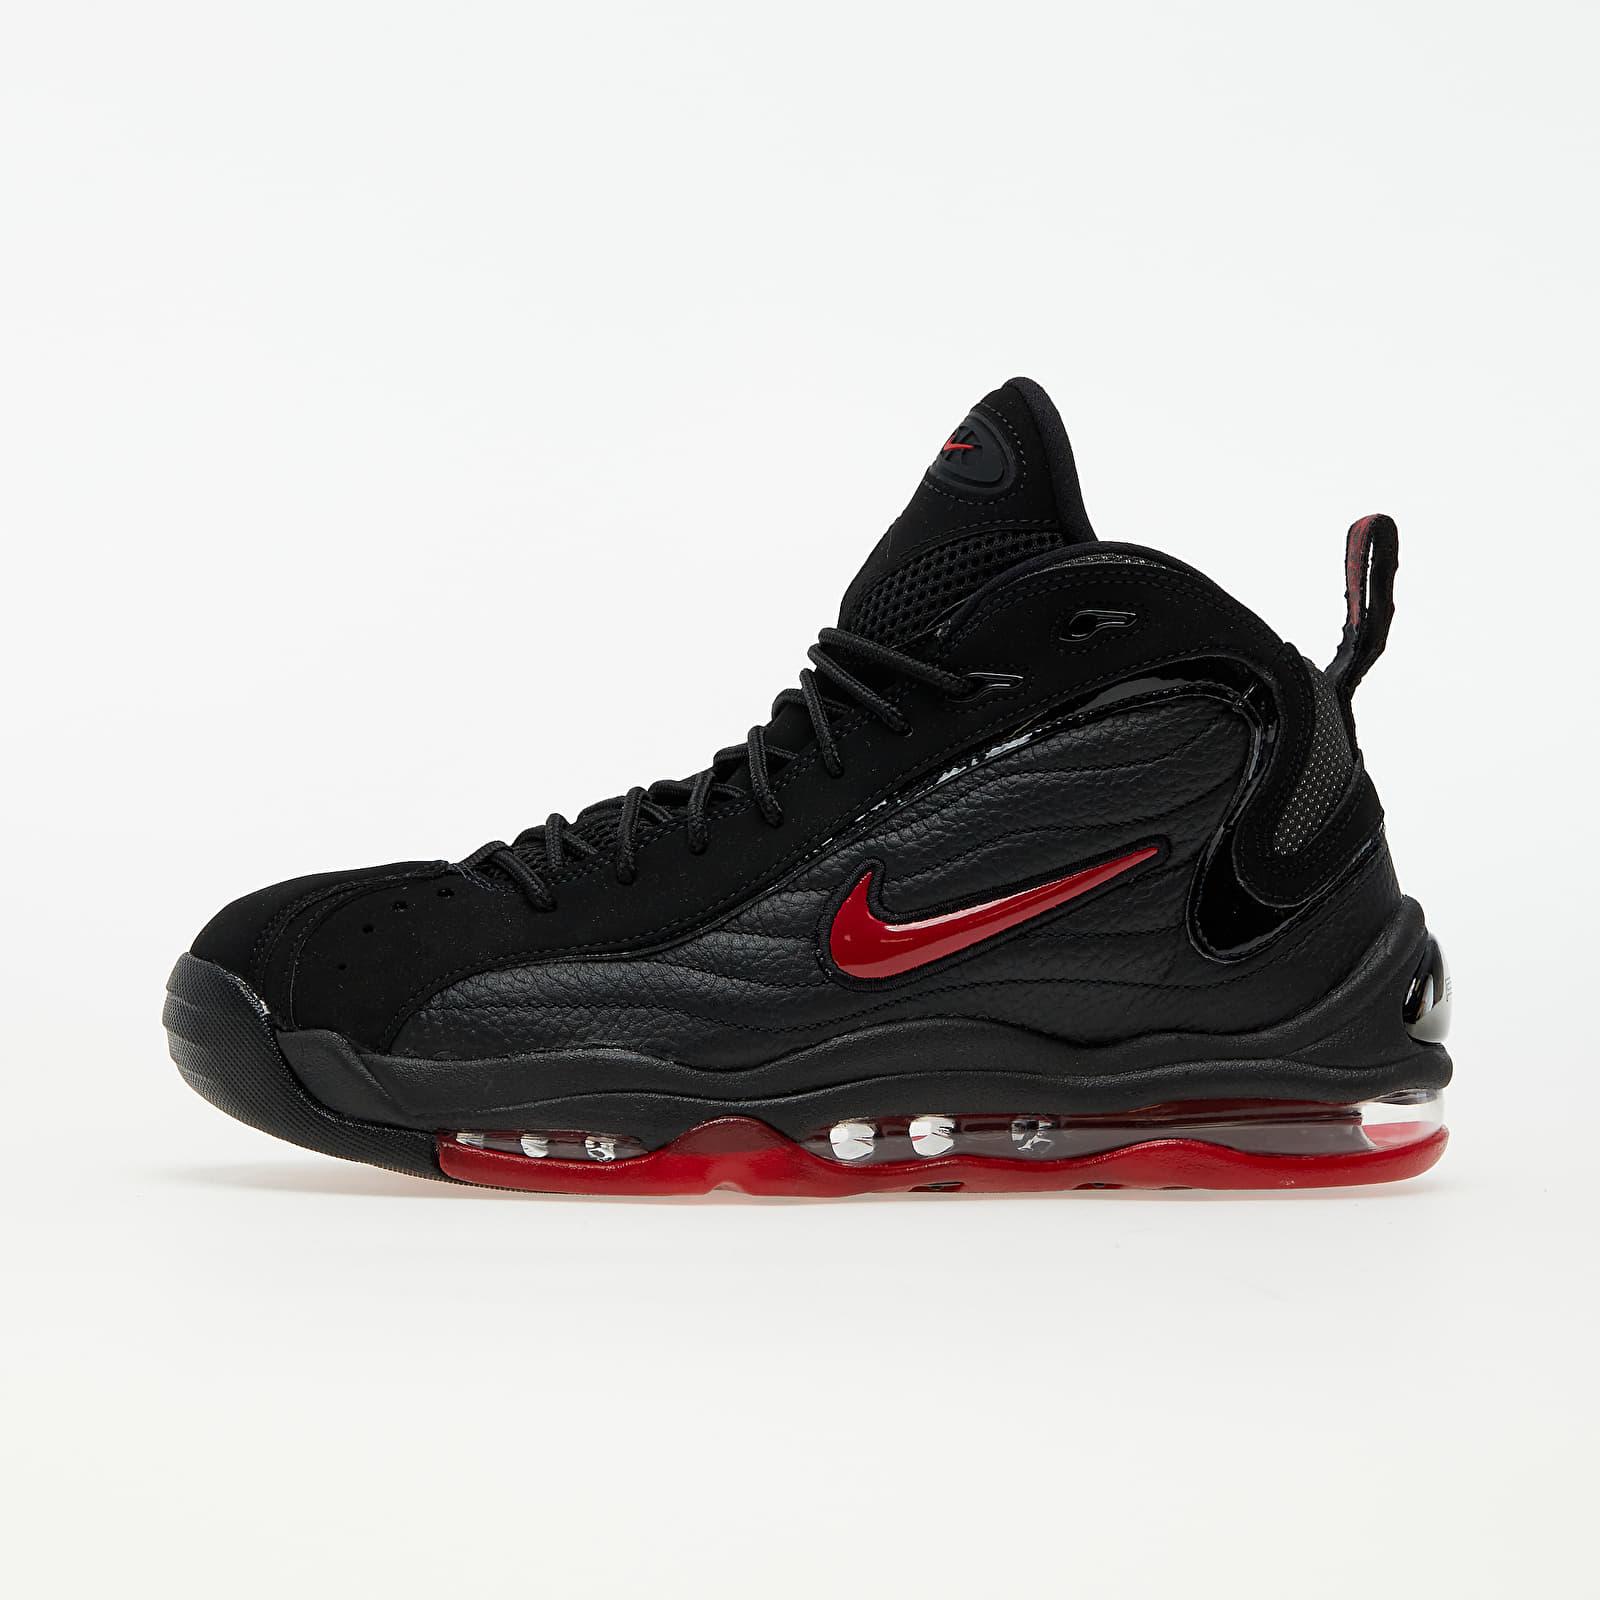 Nike Air Total Max Uptempo Black/ Varsity Red-Black EUR 42